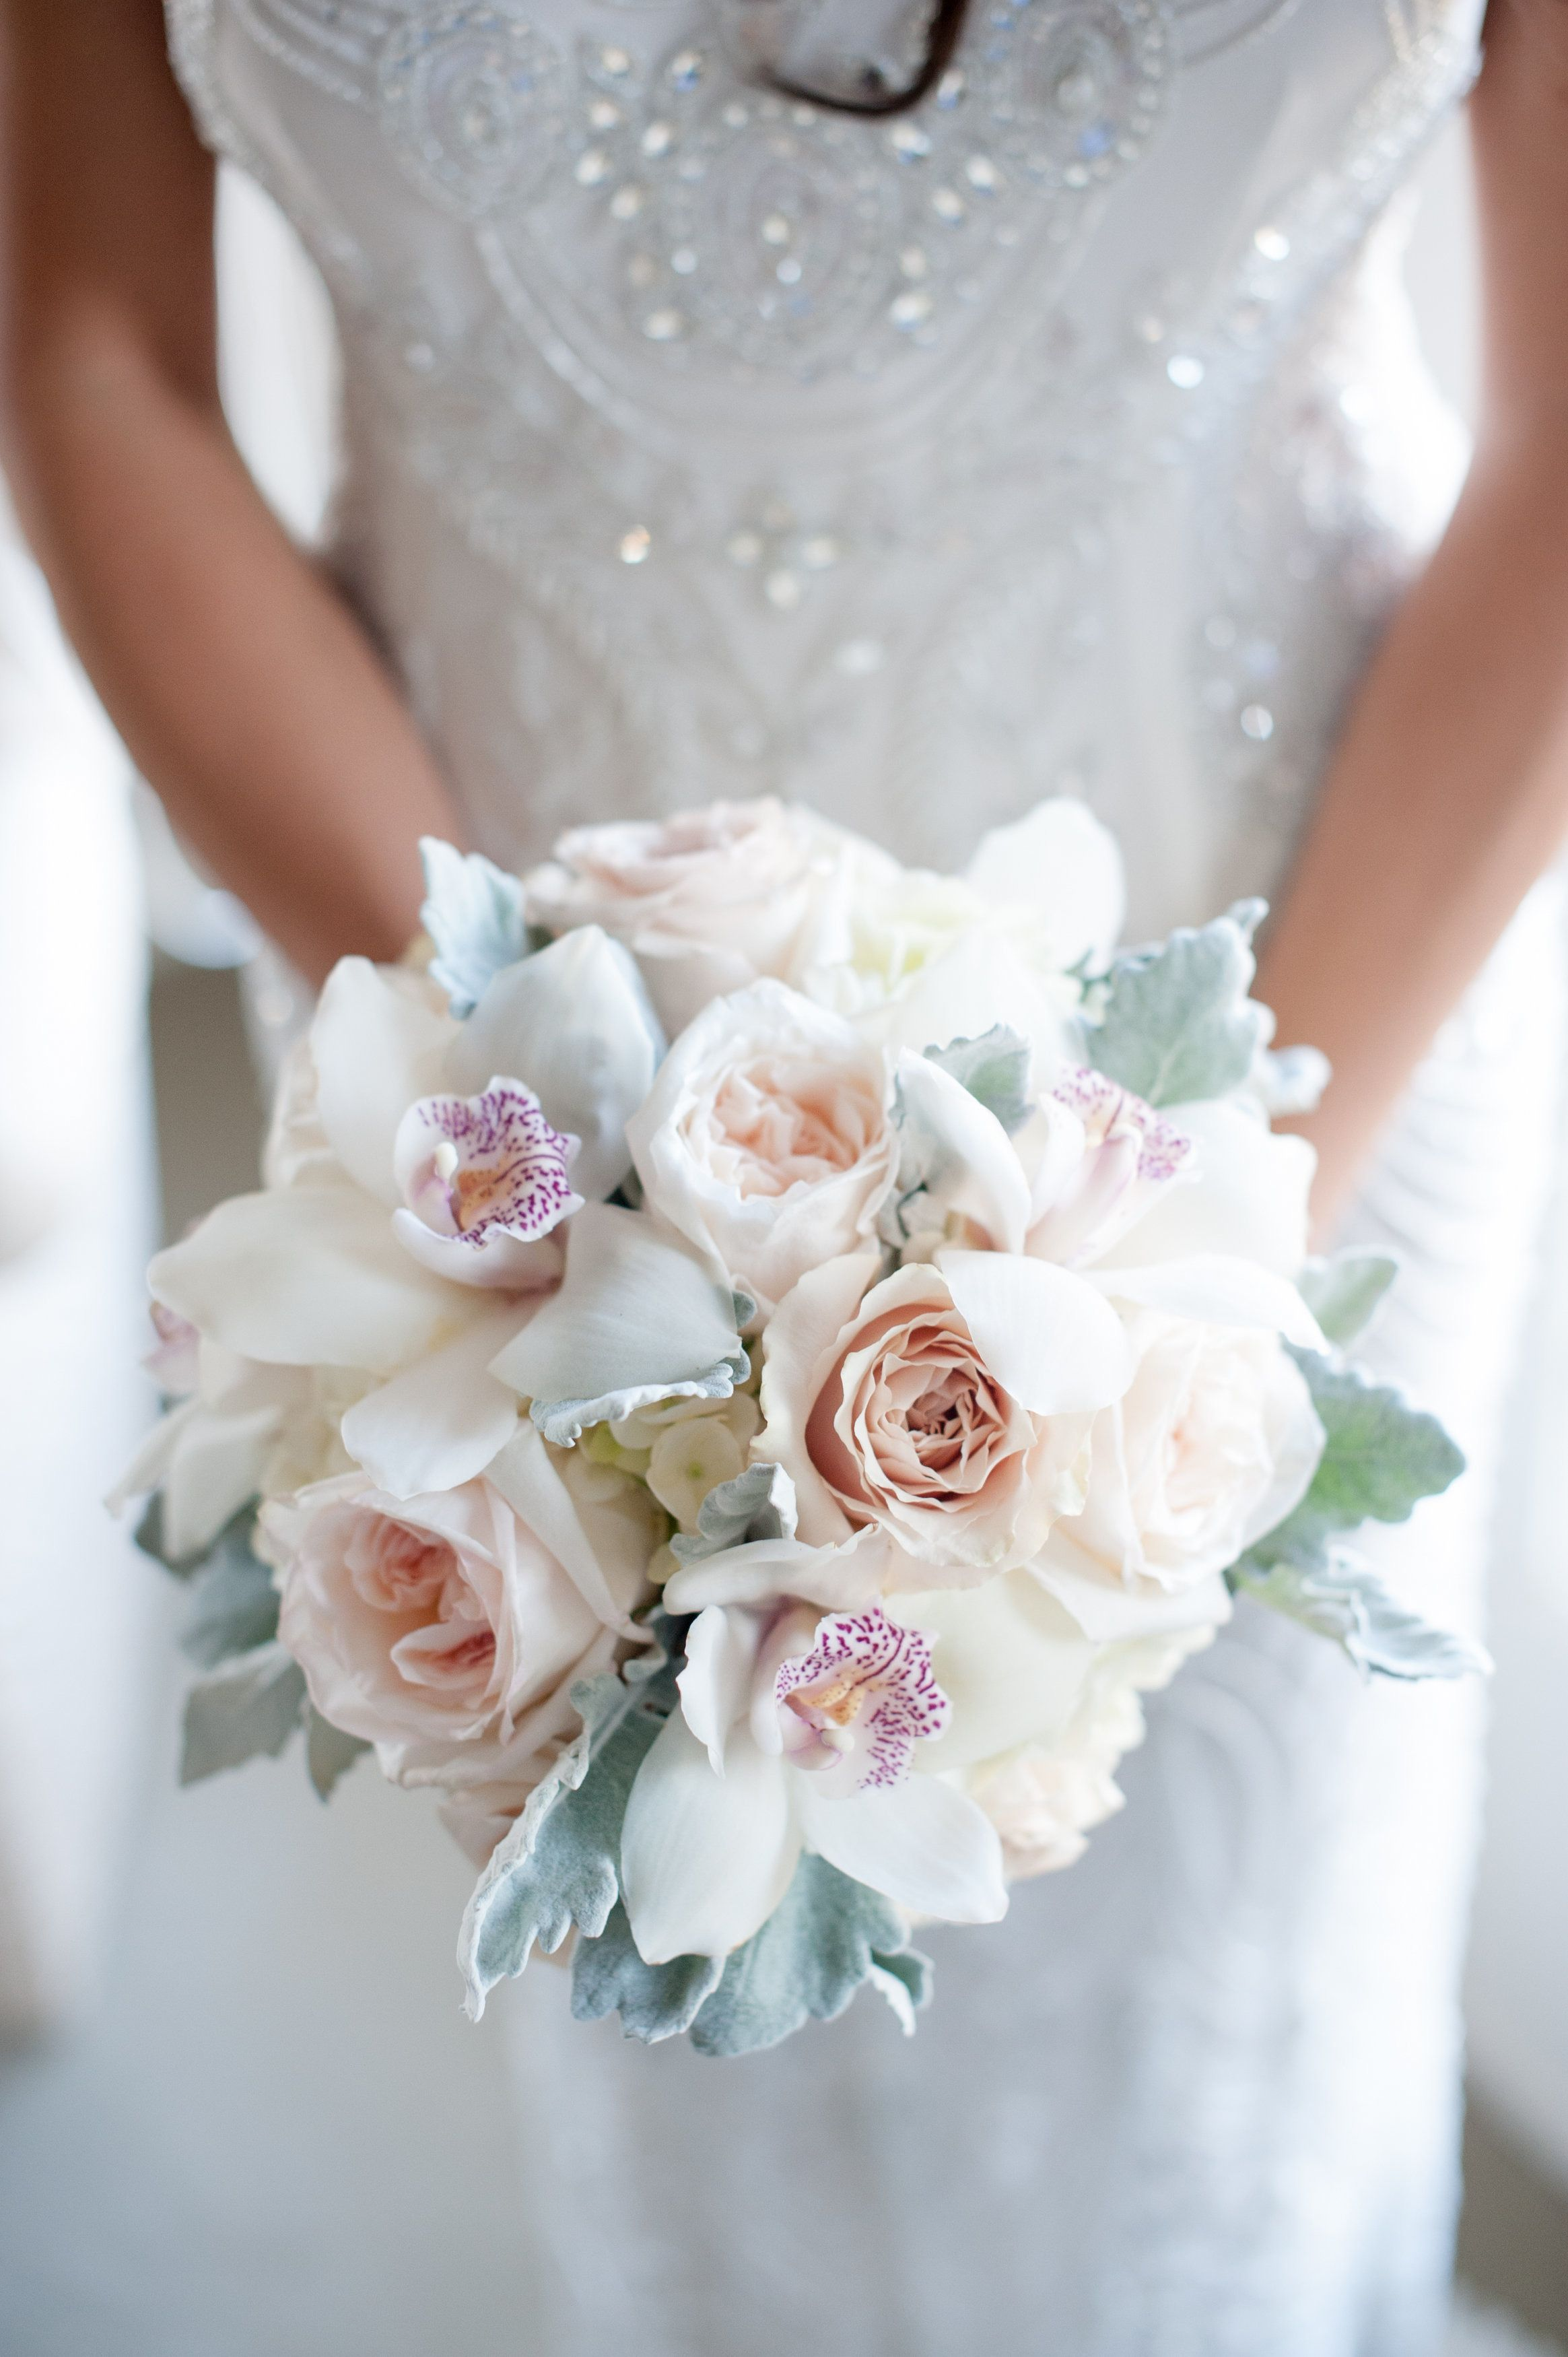 Wedding dresses with purple accents  Elegant Alberta Wedding at the Fairmont Hotel Macdonald  Svadba